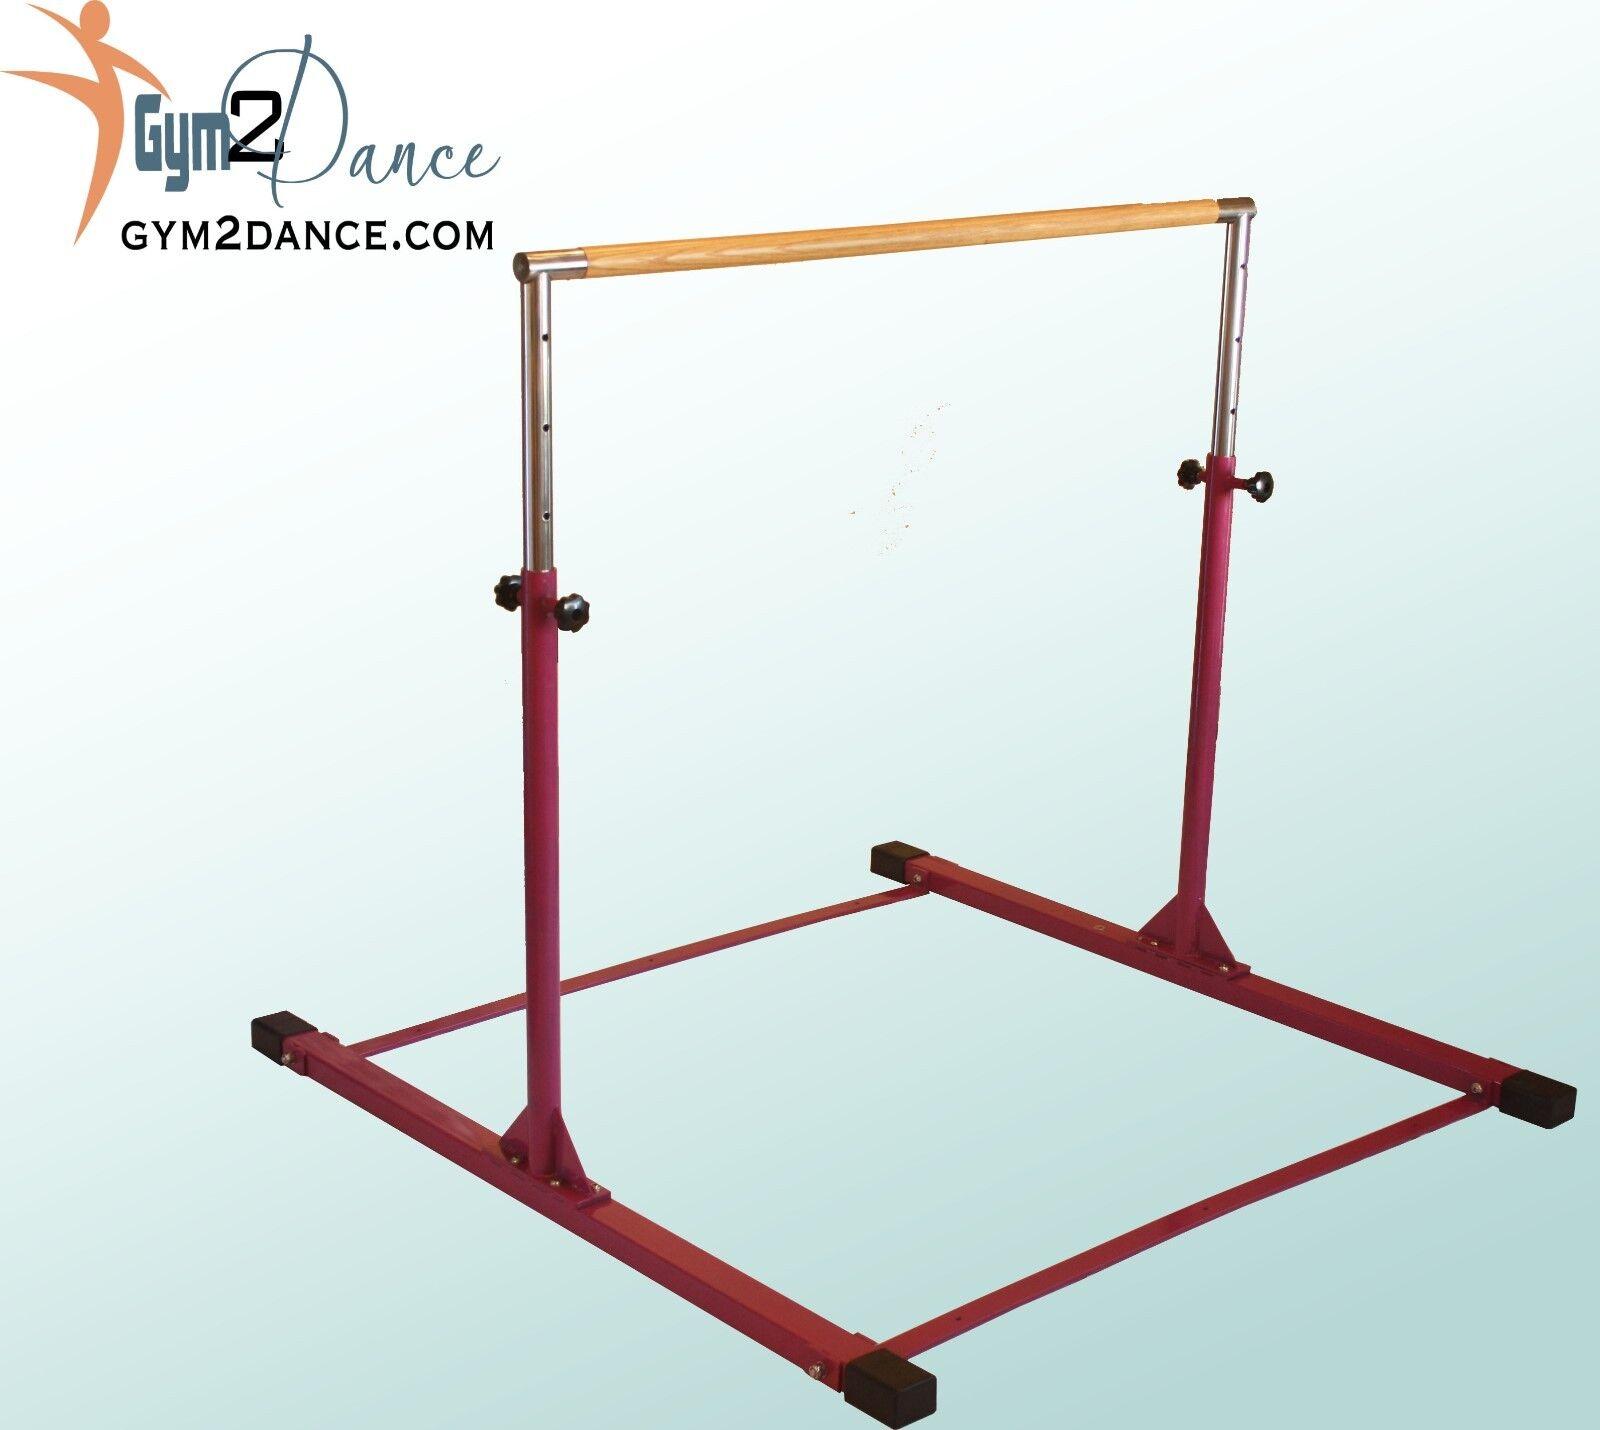 Gymnastics Bar Model DX, by Gym2Dance, Adjustable 3' - 5' solid wood, Free Ship